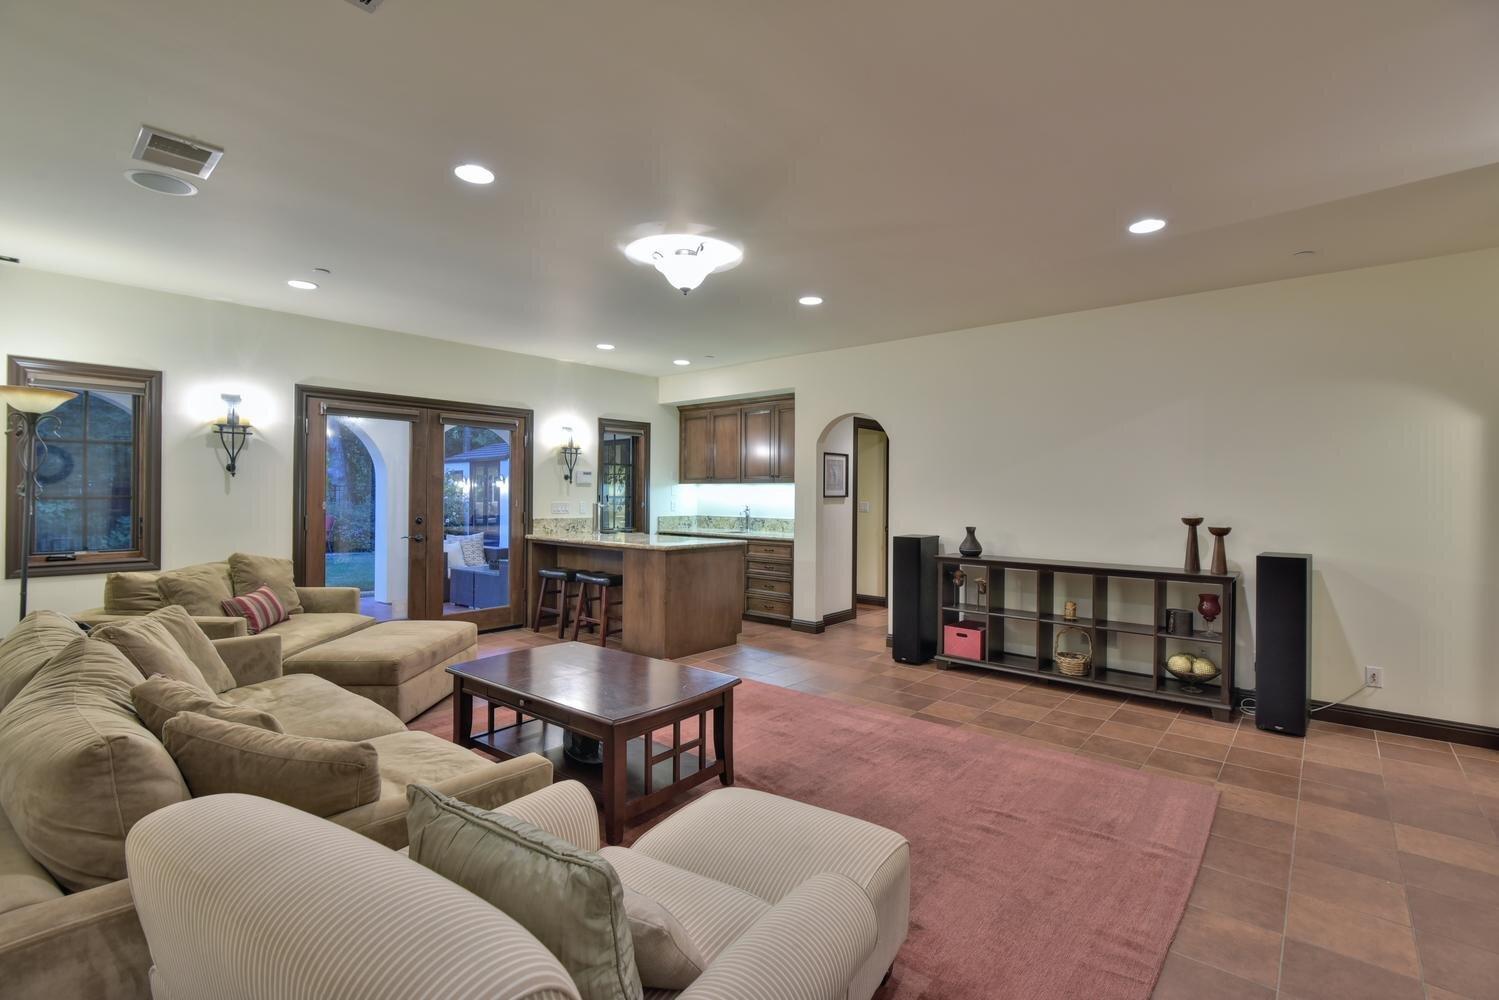 16021 Winterbrook Rd Los Gatos-large-024-016-Family Room View-1500x1000-72dpi.jpg